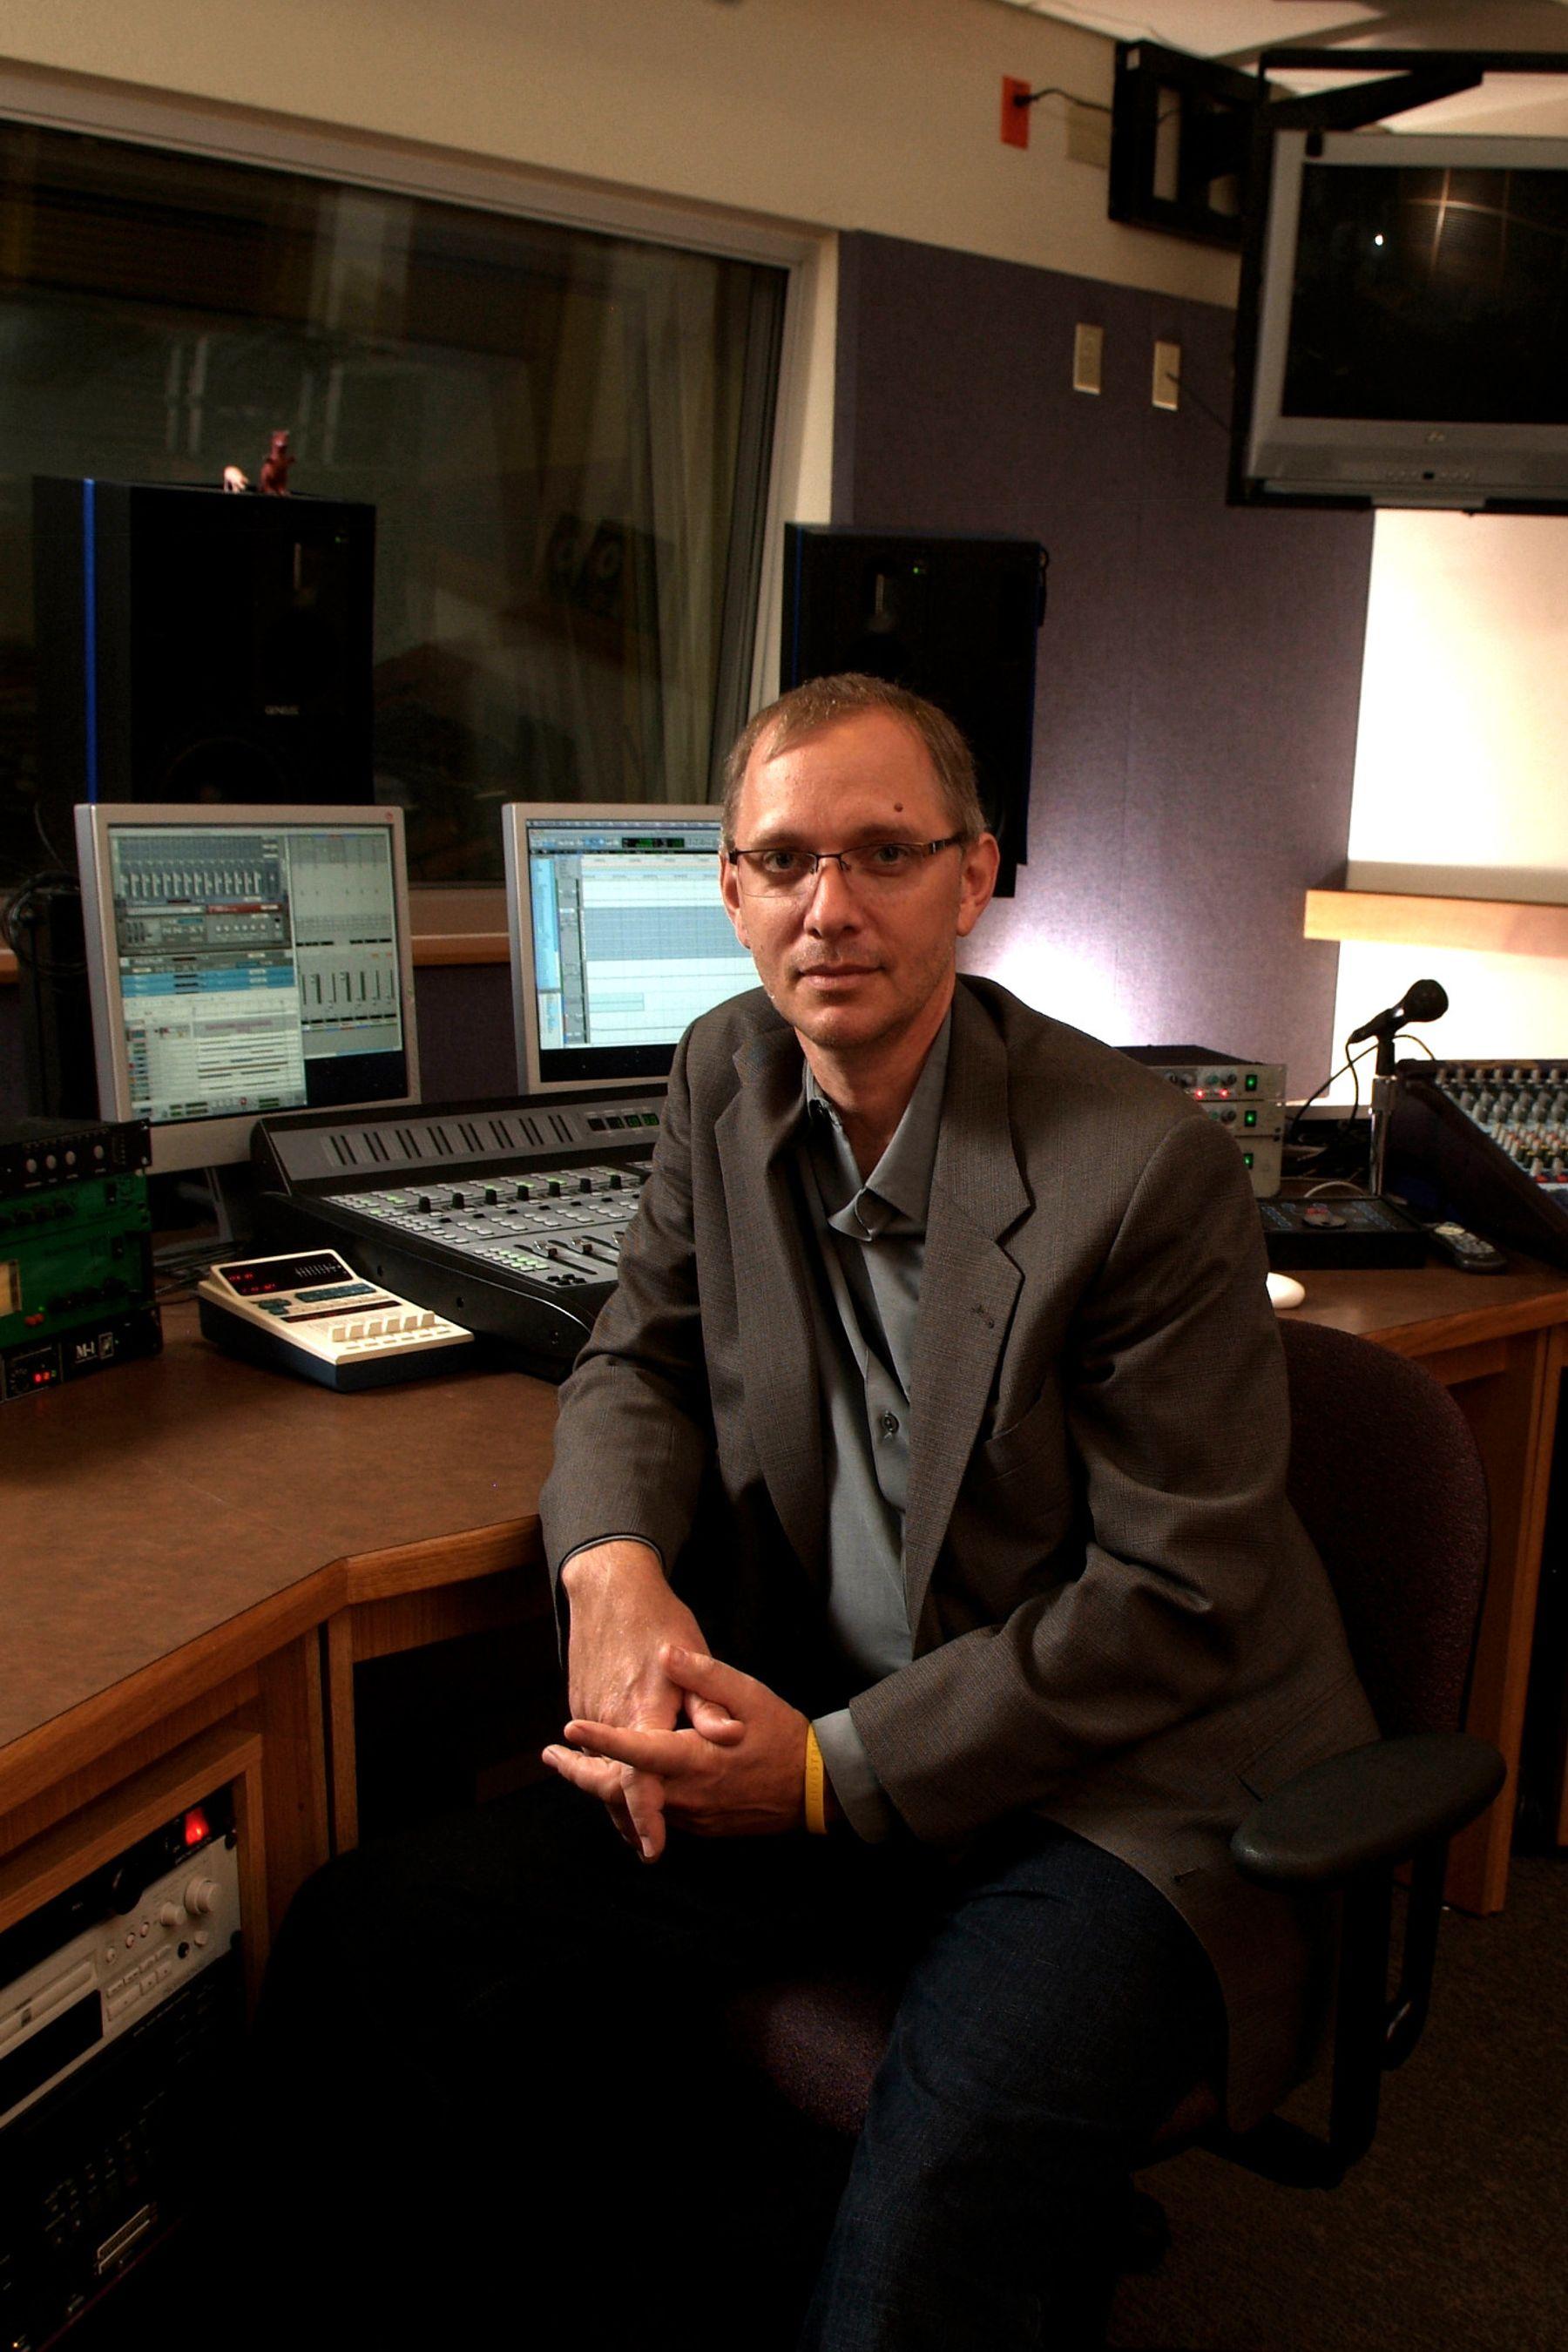 Michael Schulze in a recording studio